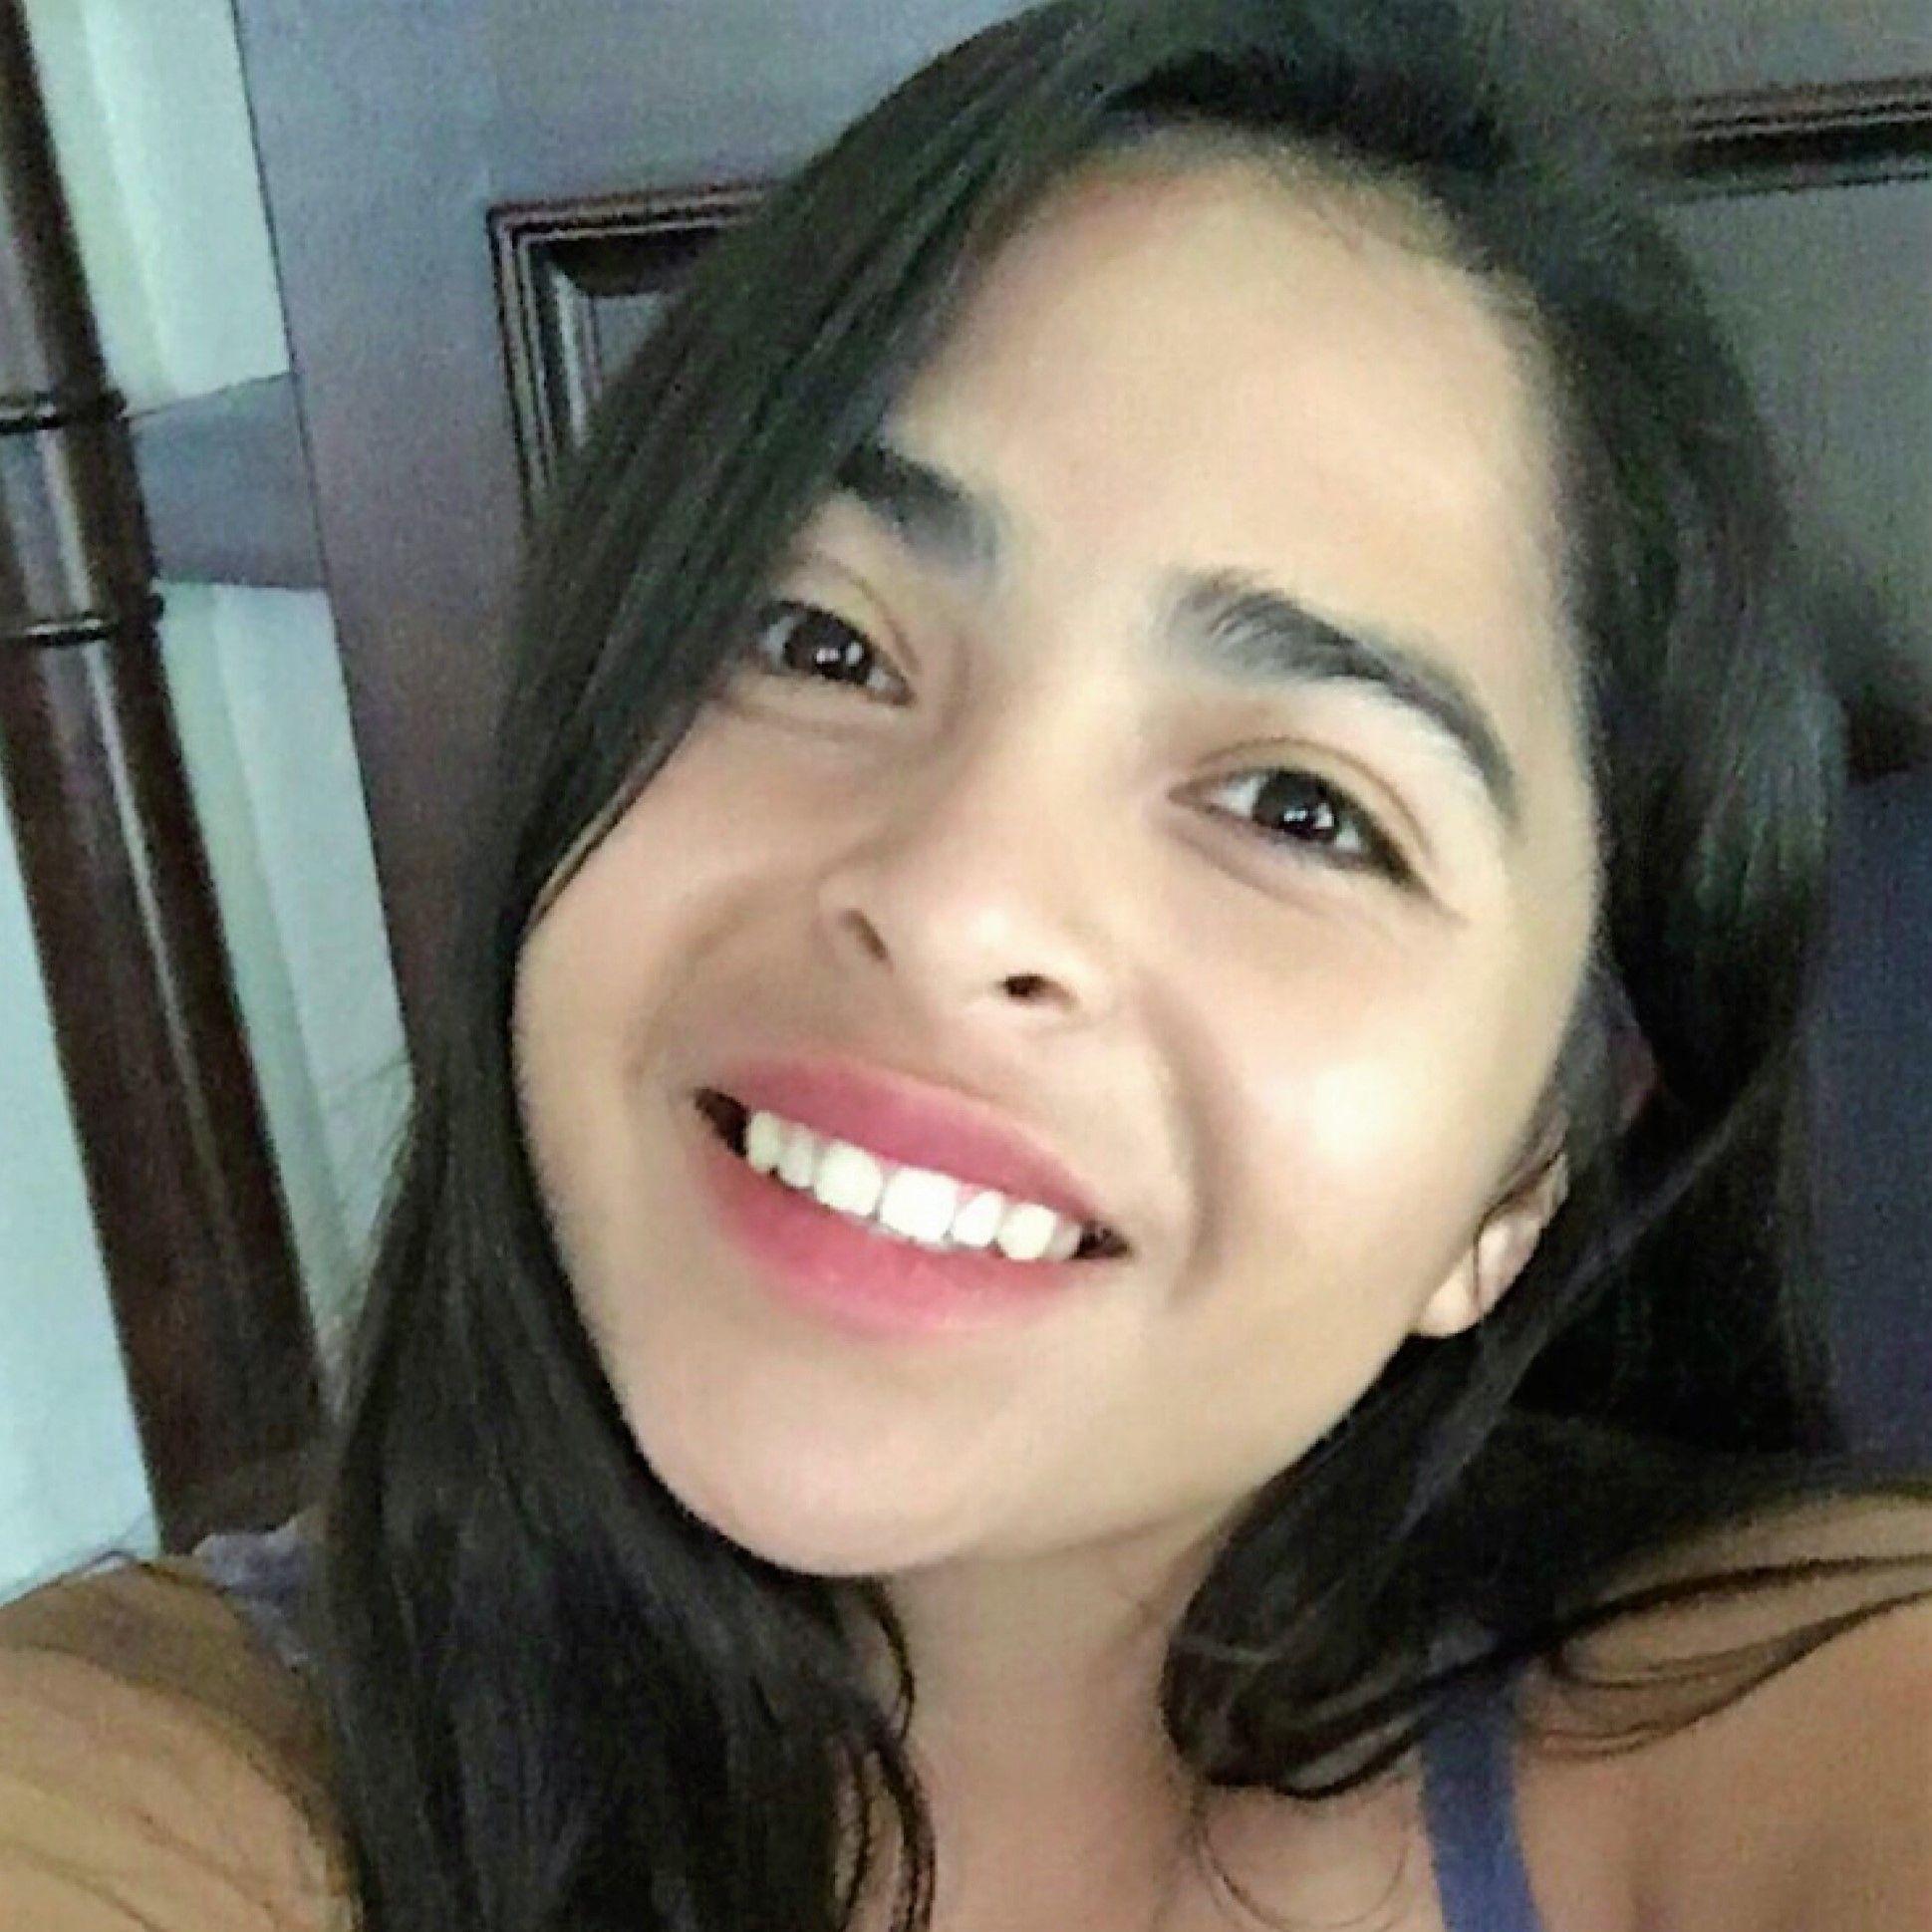 Angela Orellana Sanchez